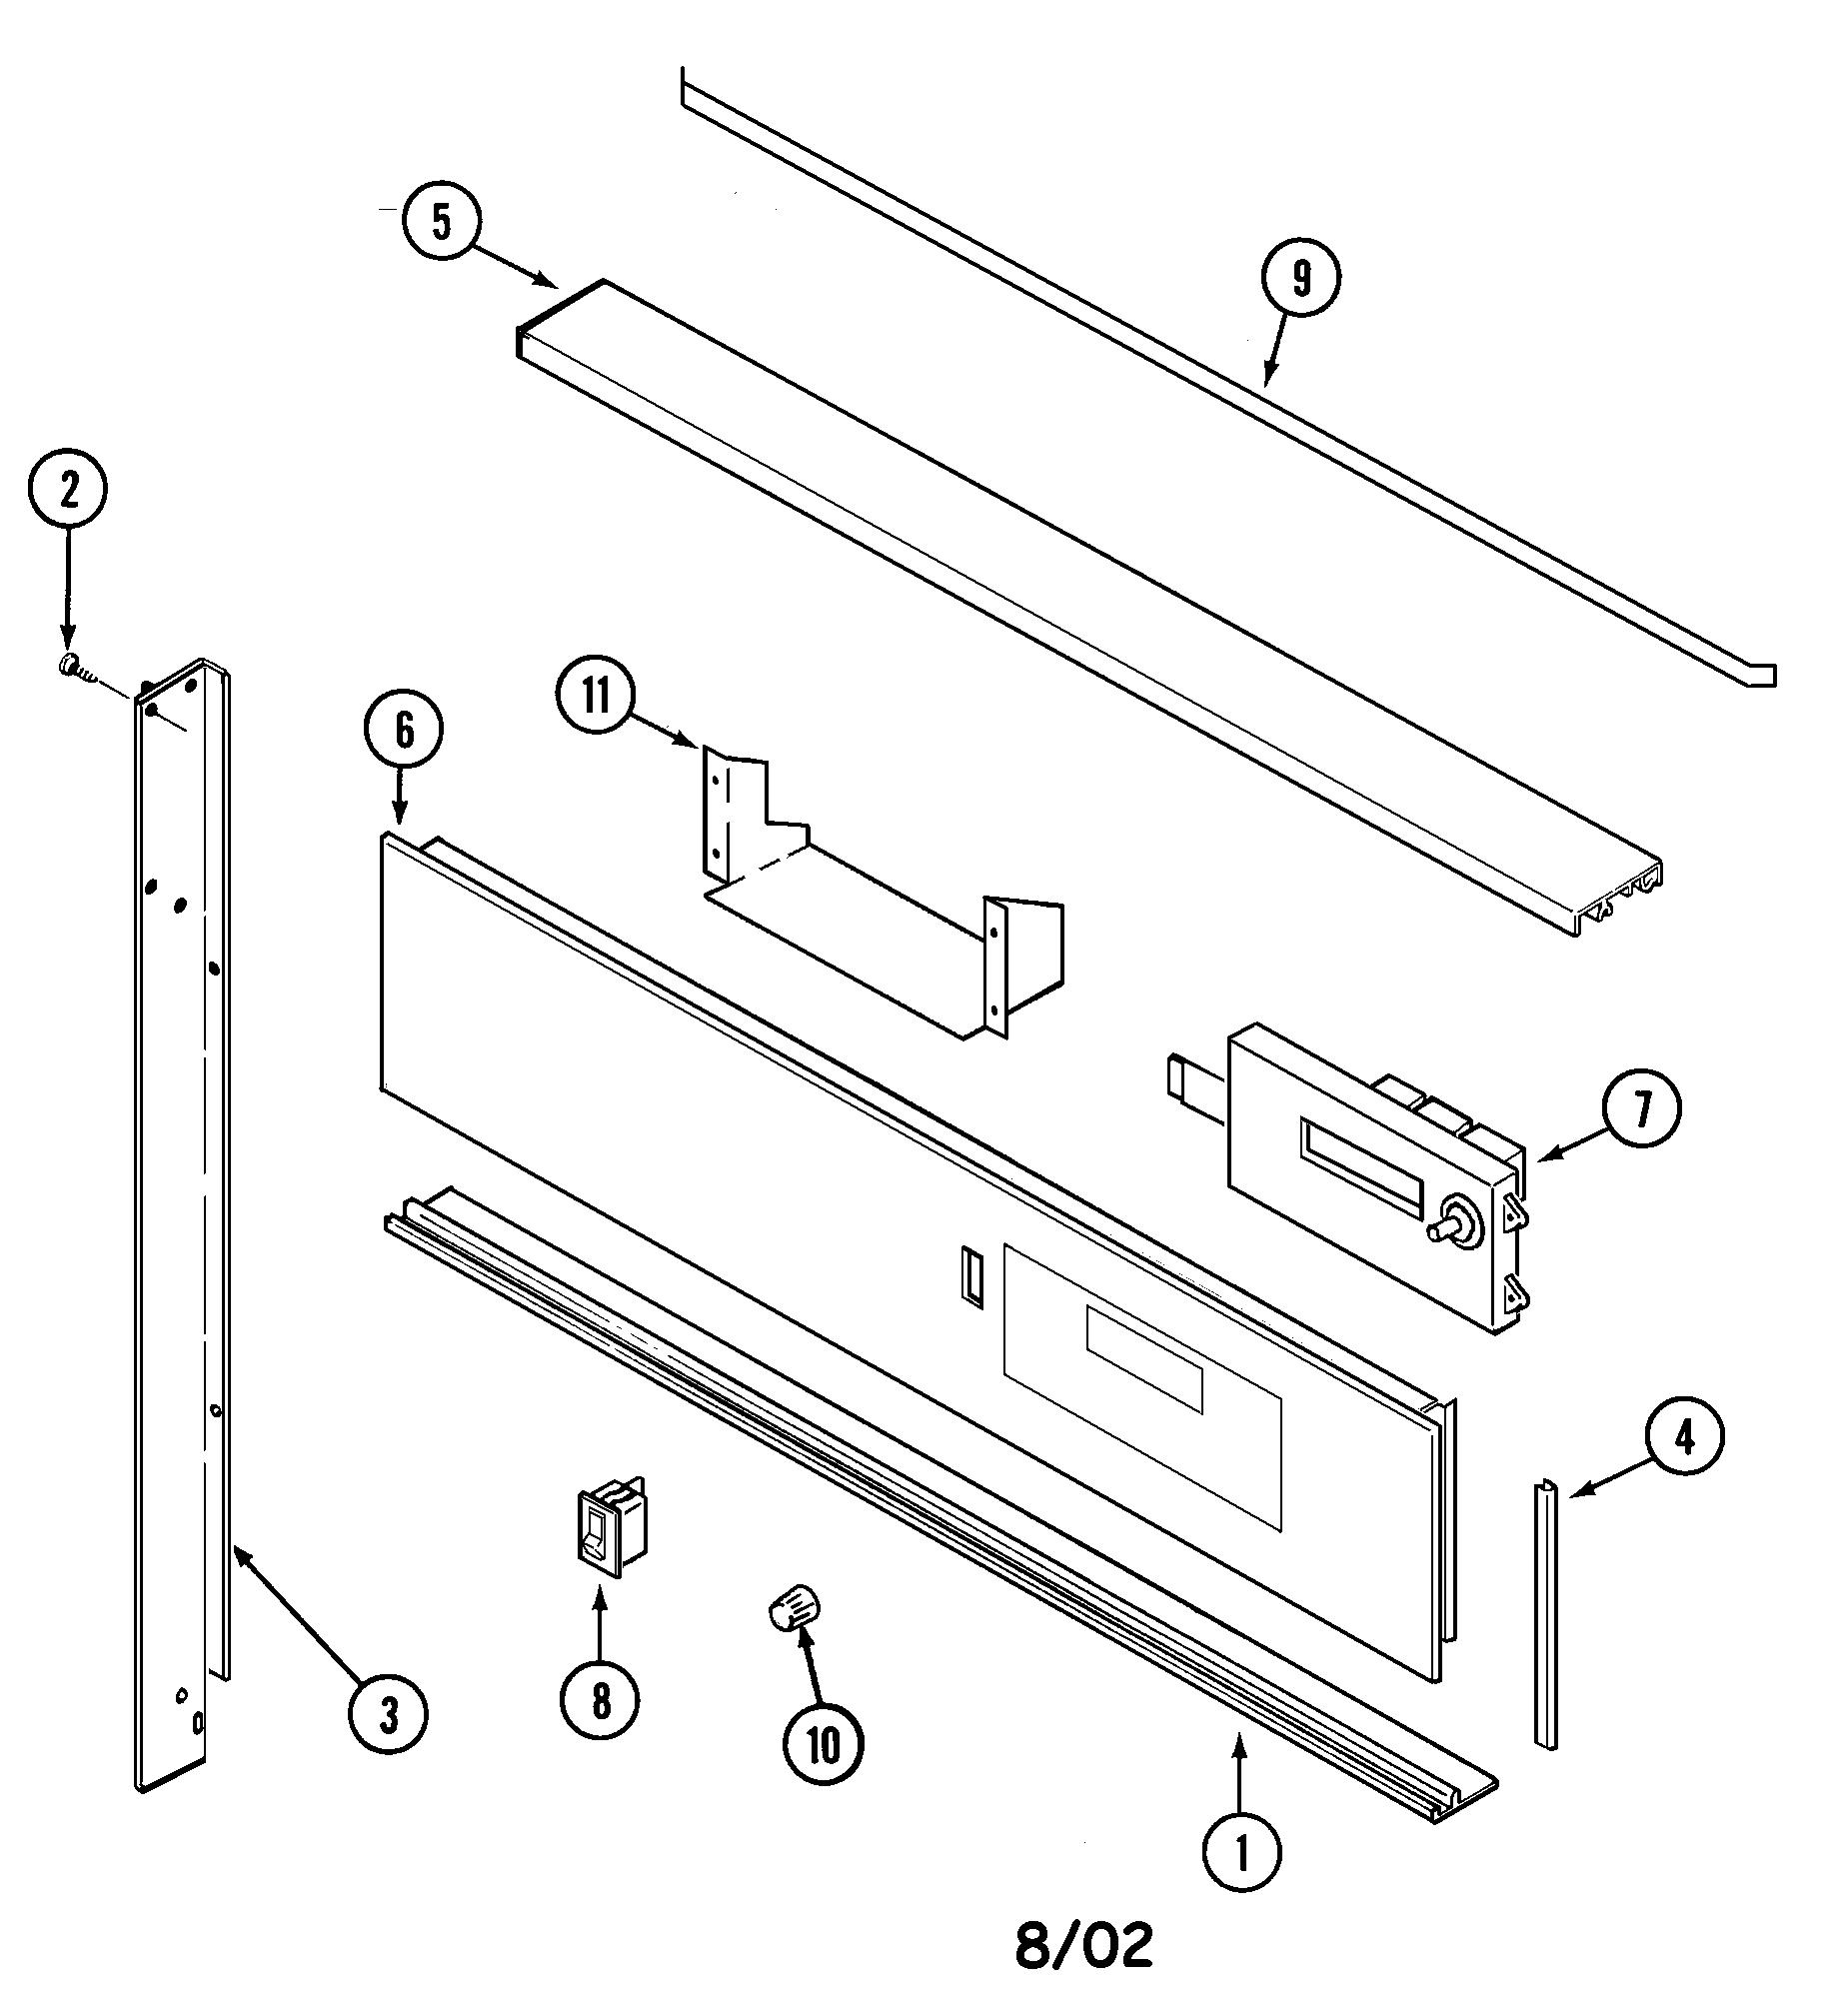 Magic Chef Microwave Wiring Diagram | Wiring Diagram Database on